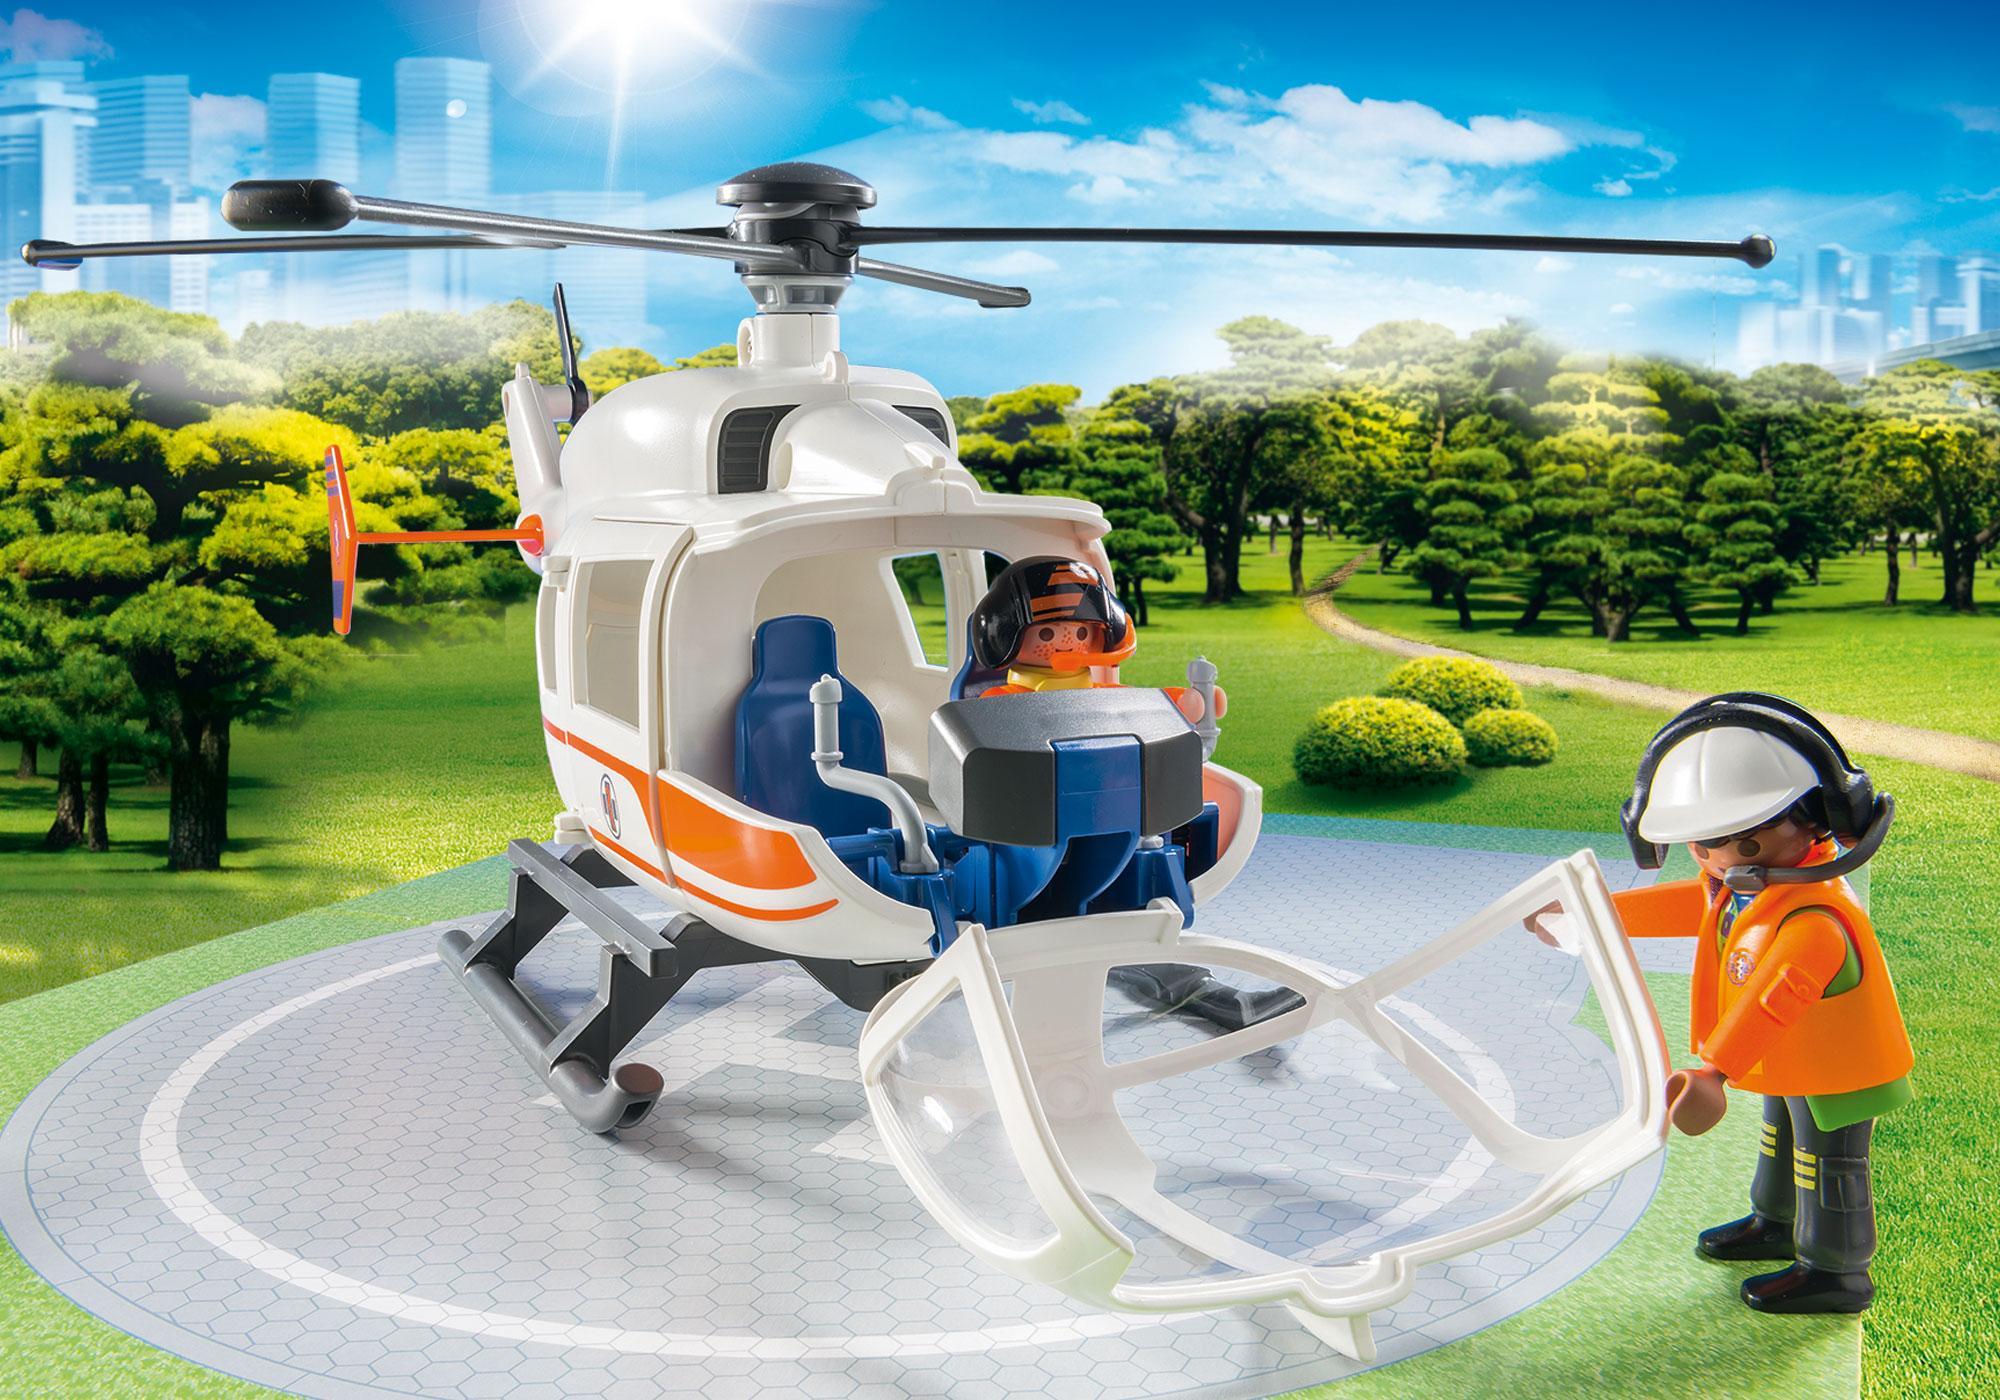 http://media.playmobil.com/i/playmobil/70048_product_extra1/Eerste hulp helikopter